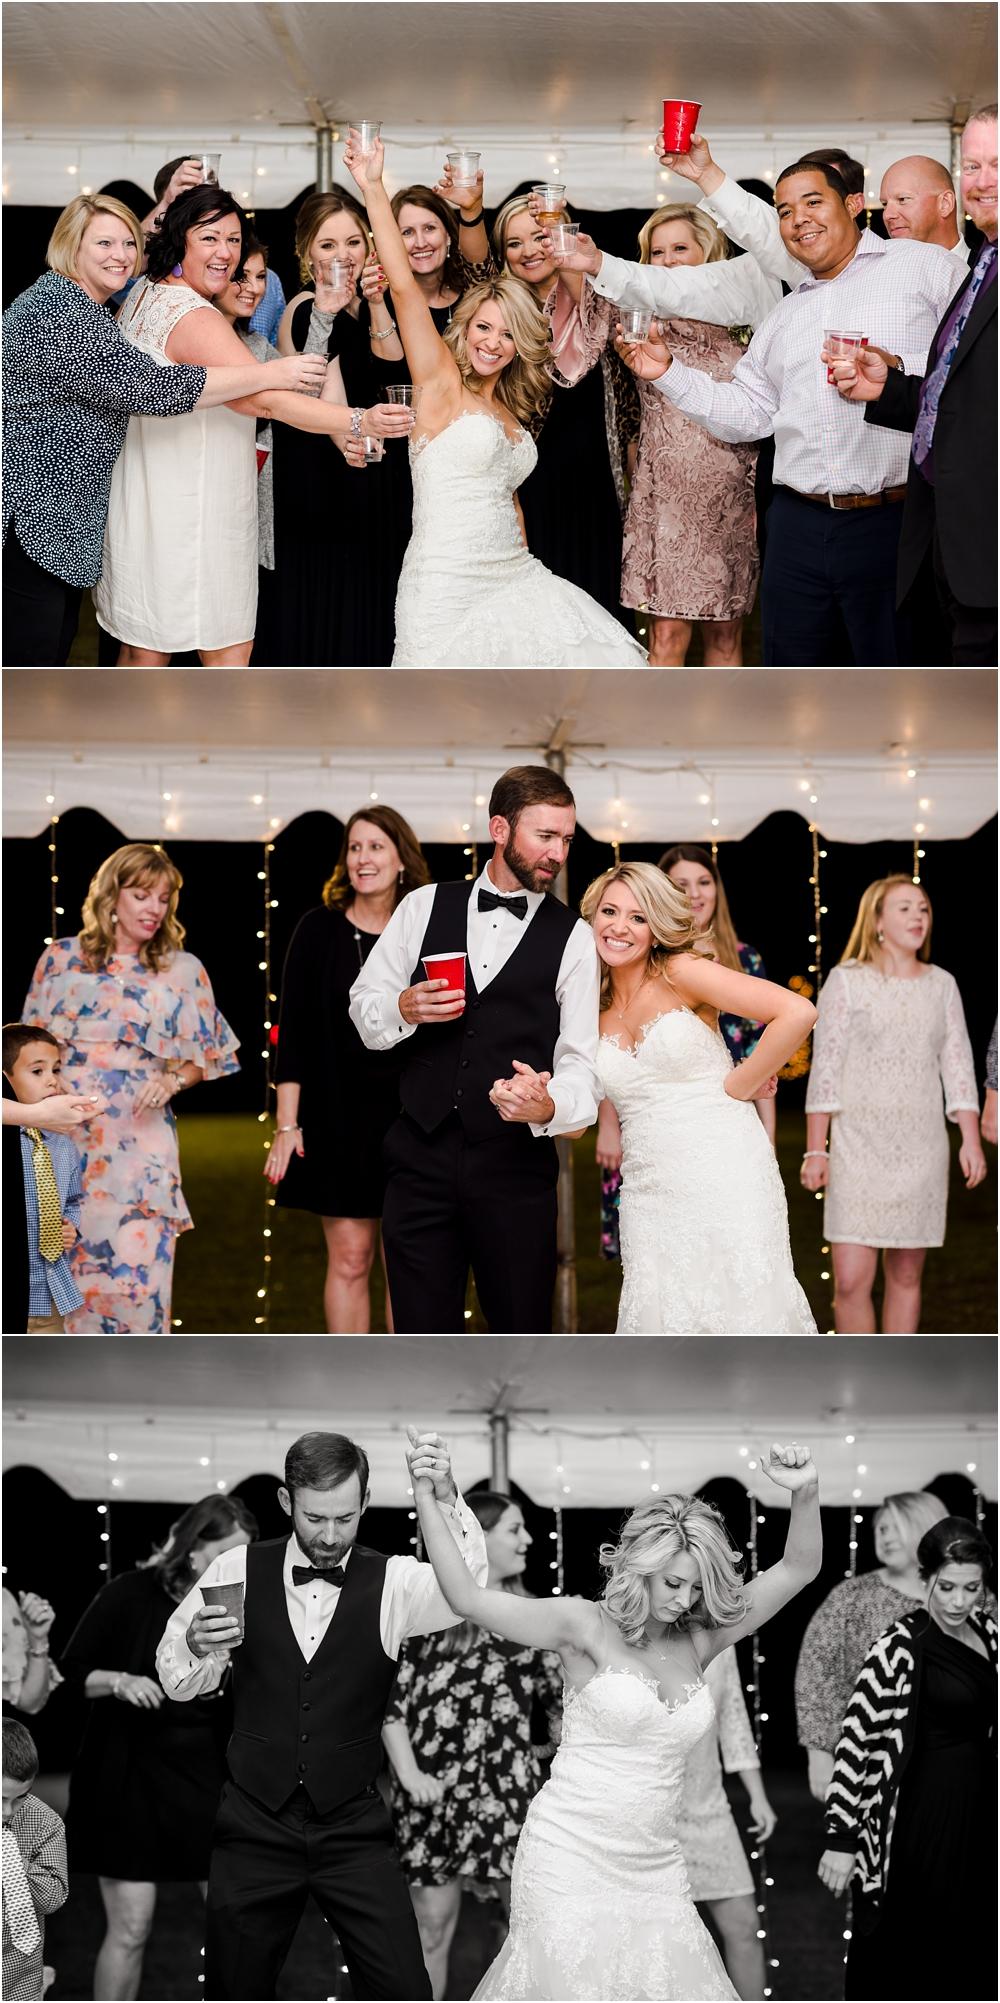 buchanan-florida-wedding-photographer-kiersten-grant (761 of 800).jpg